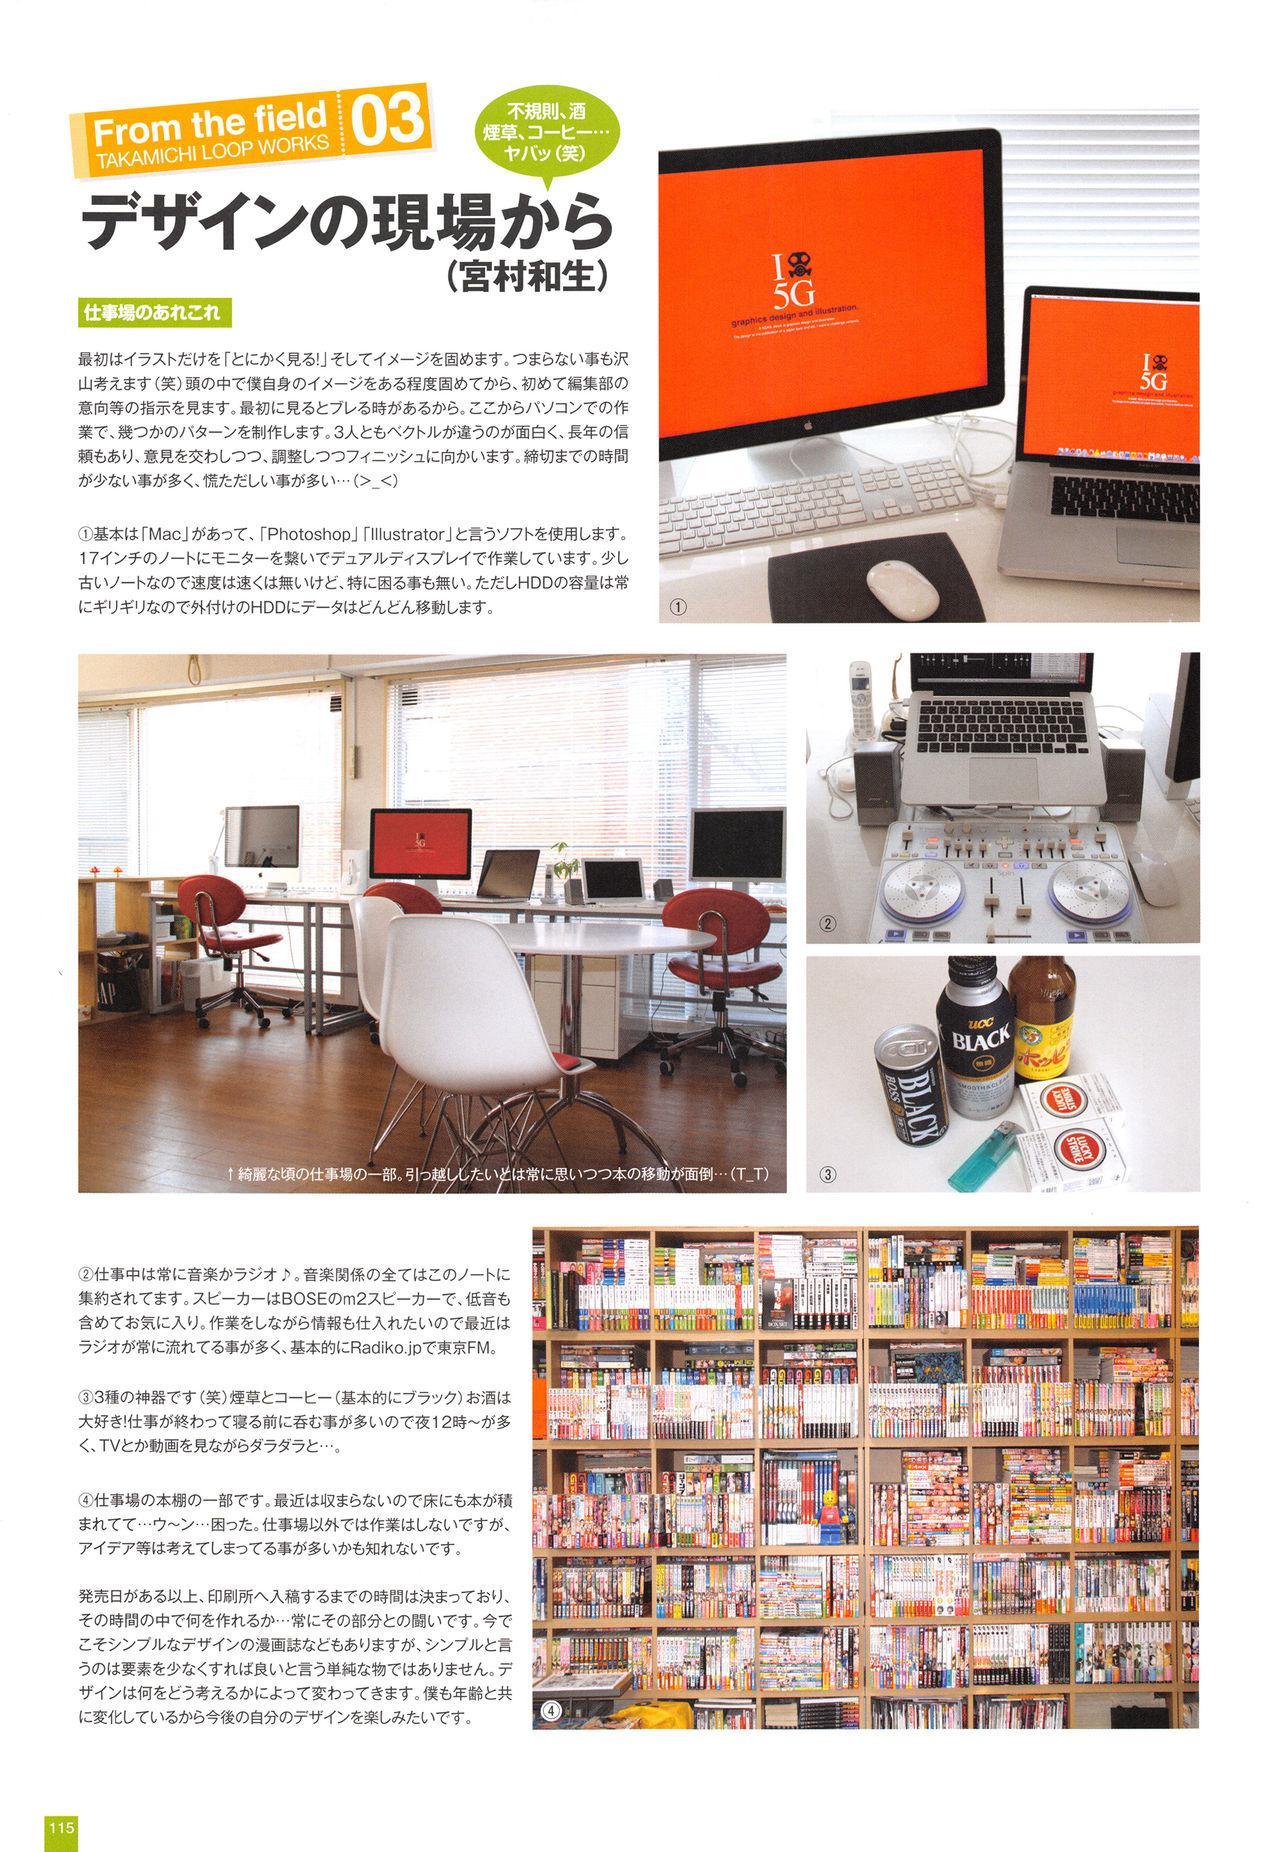 LO Artbook 2-A TAKAMICHI LOOP WORKS 117